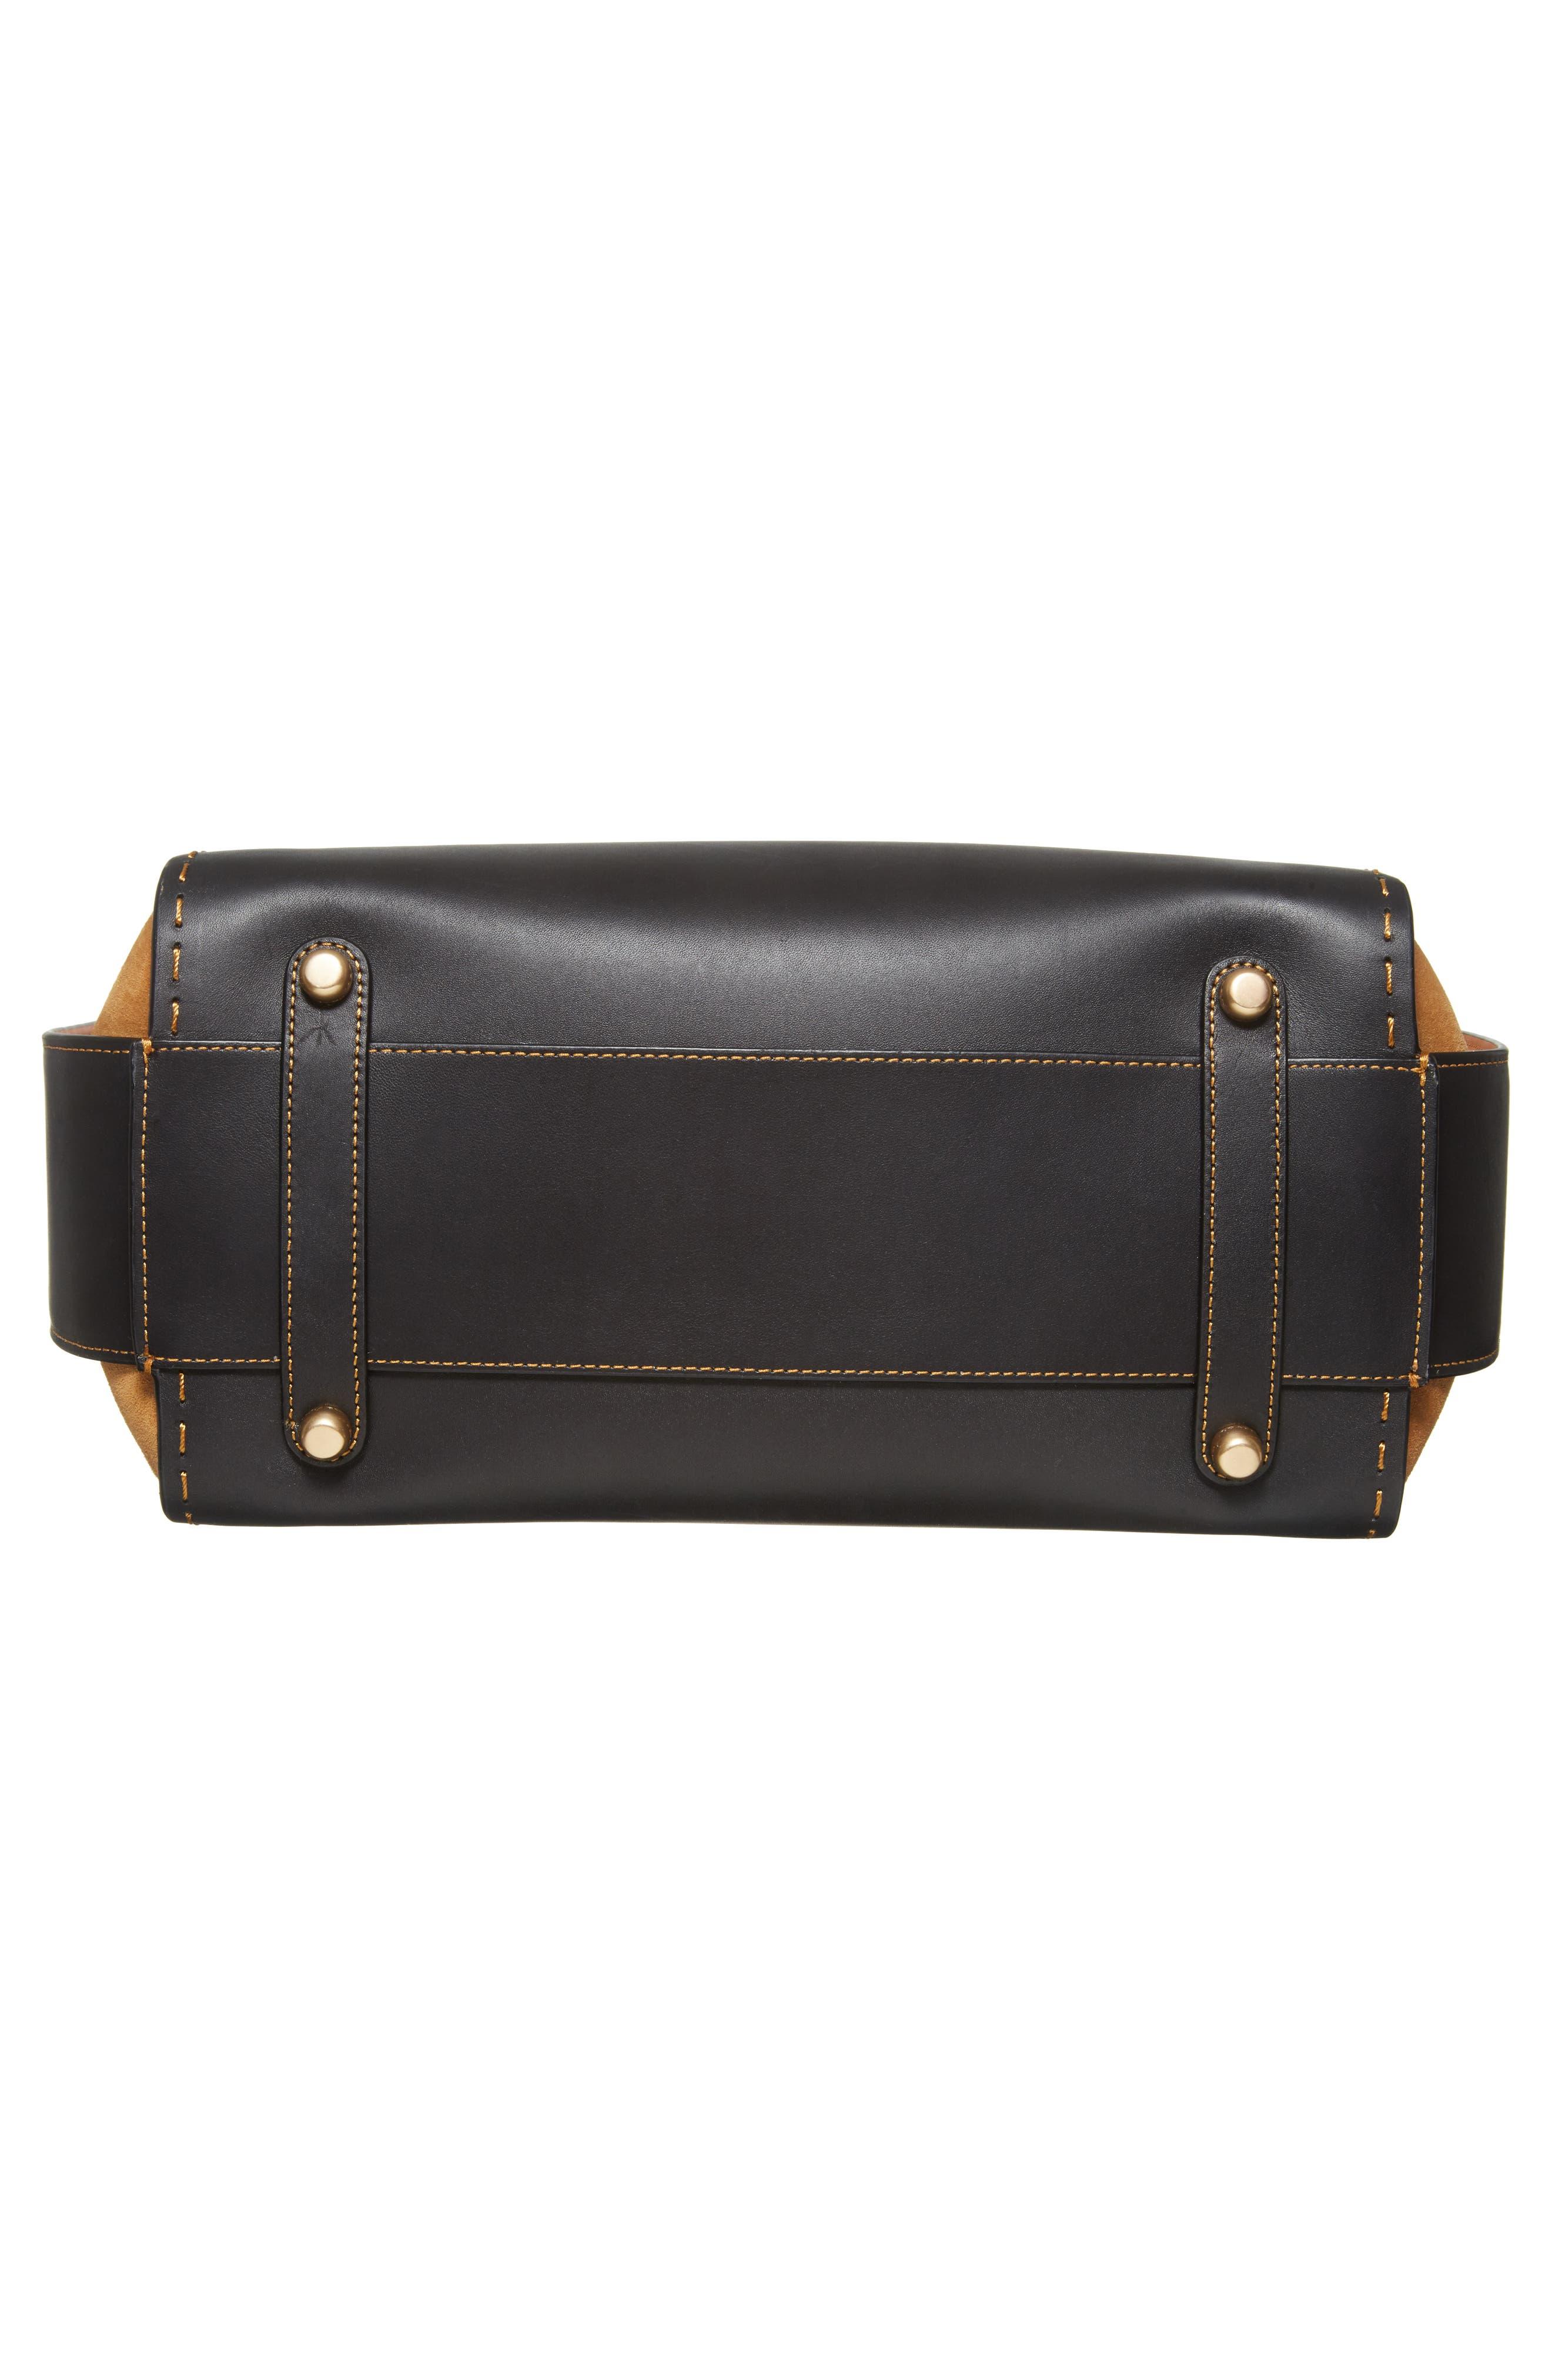 Double Swagger Leather Satchel,                             Alternate thumbnail 6, color,                             Black Multi